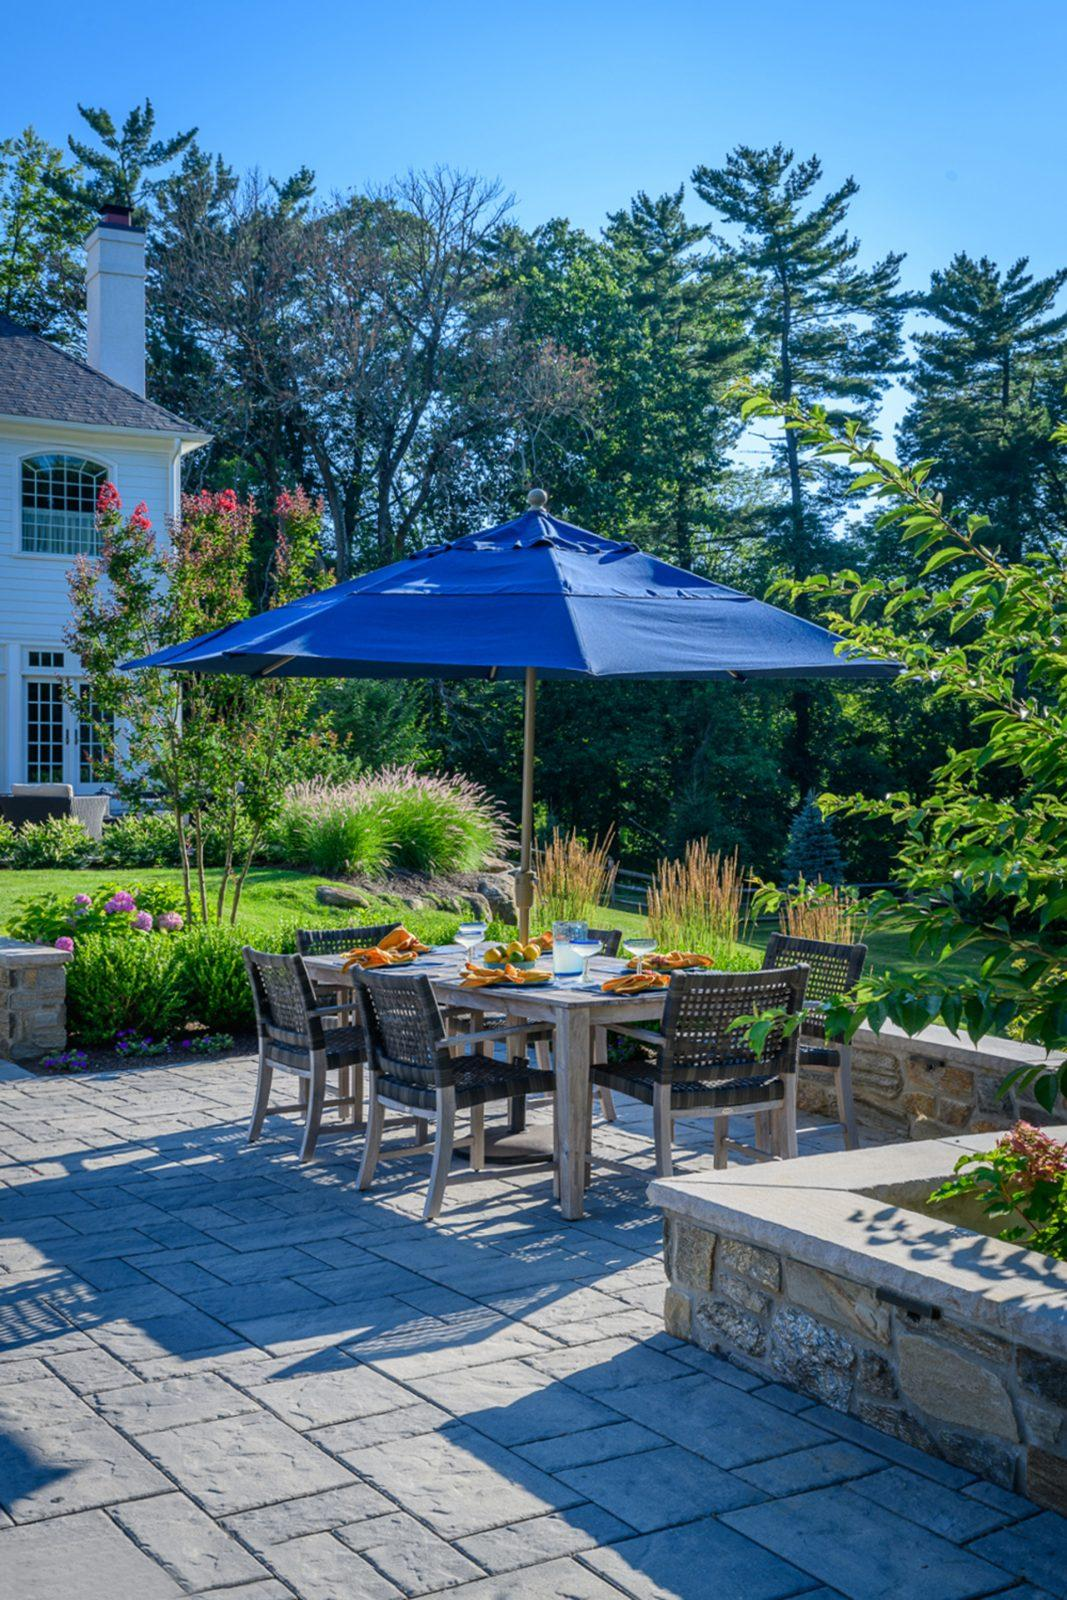 main-line-pa-wayne-outdoor-dining-backyard-patio-design